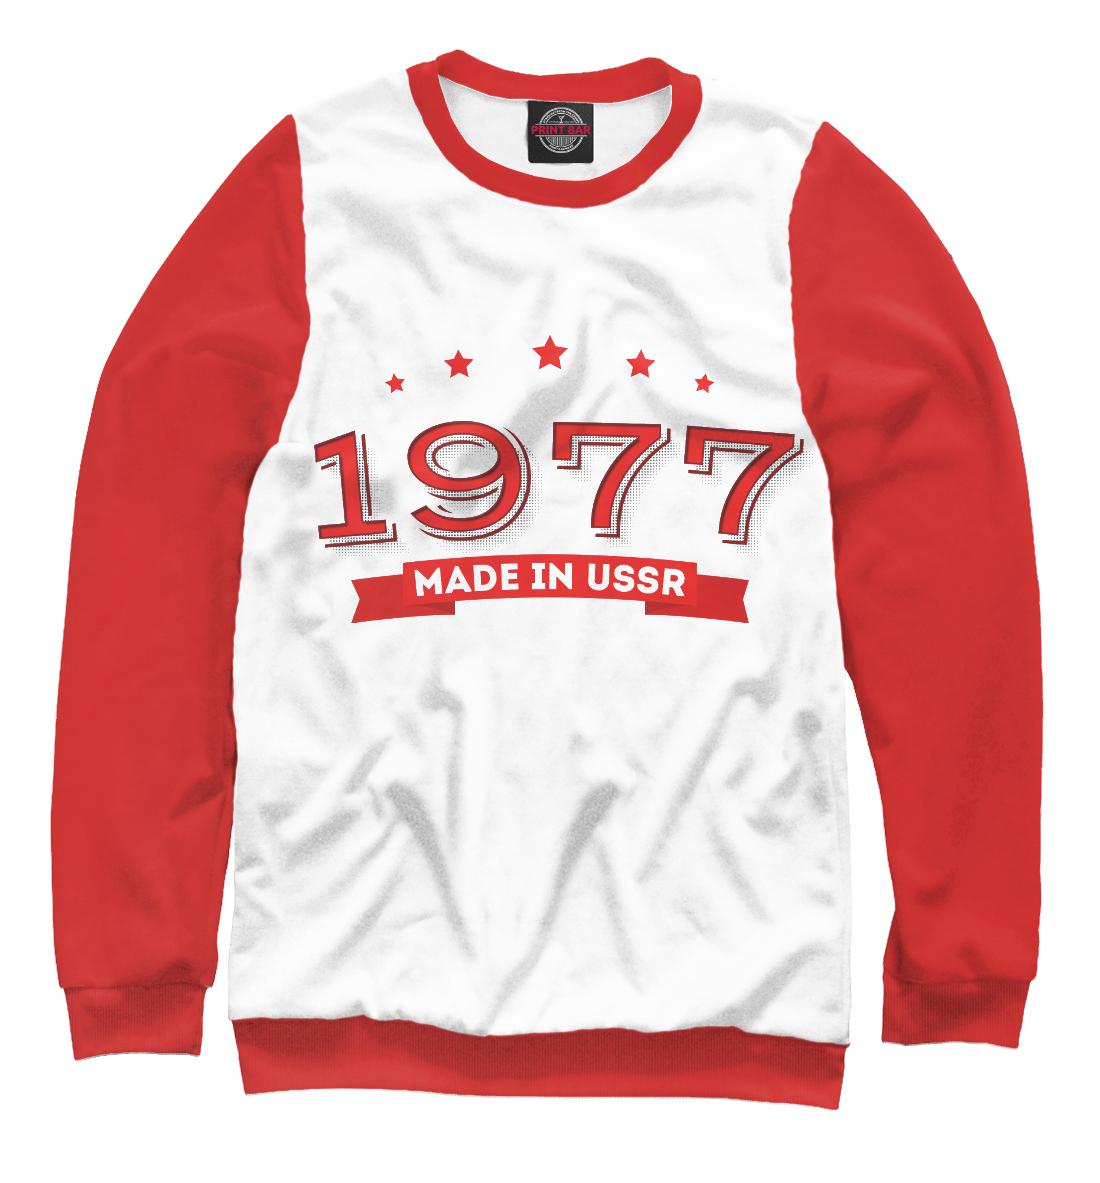 Купить Made in 1977 USSR, Printbar, Свитшоты, DSE-463006-swi-1